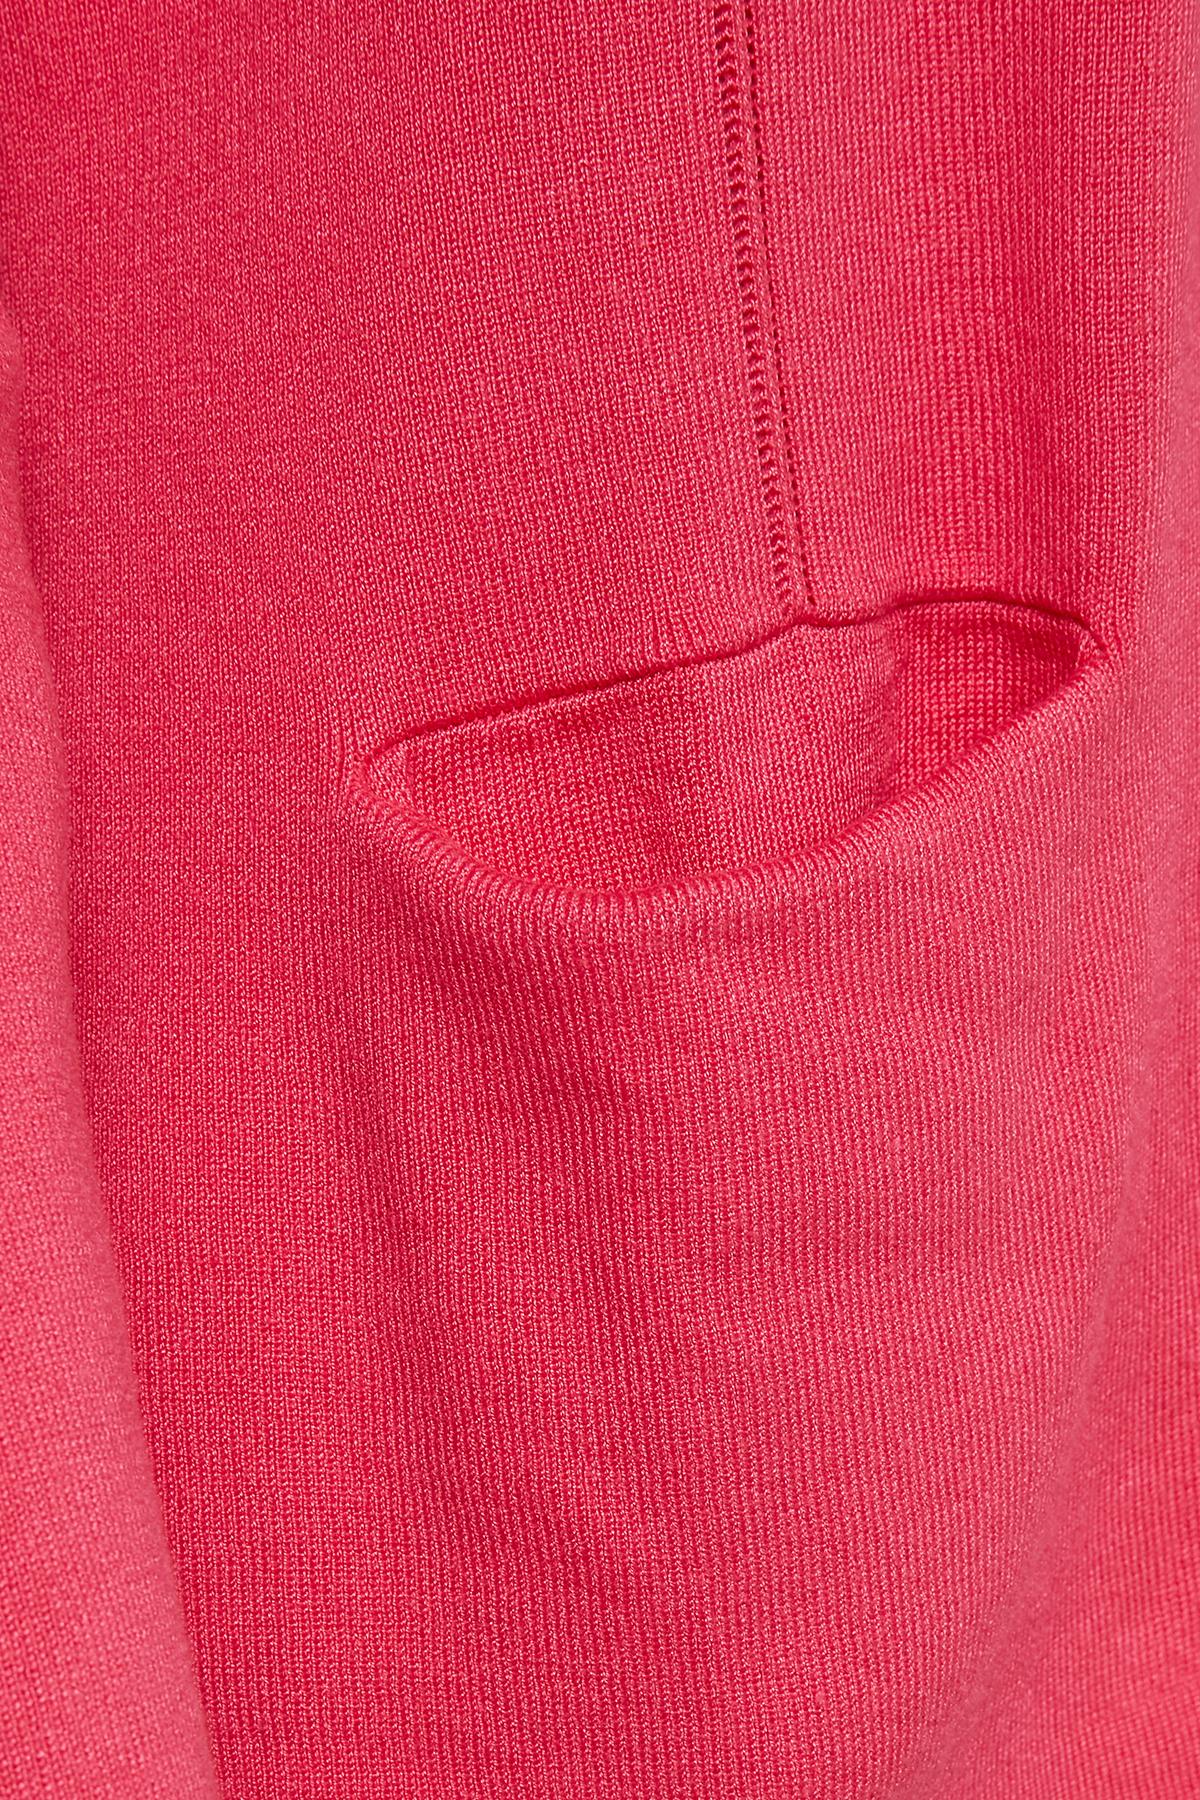 Rød Cardigan fra Pulz Jeans – Køb Rød Cardigan fra str. XS-XXL her